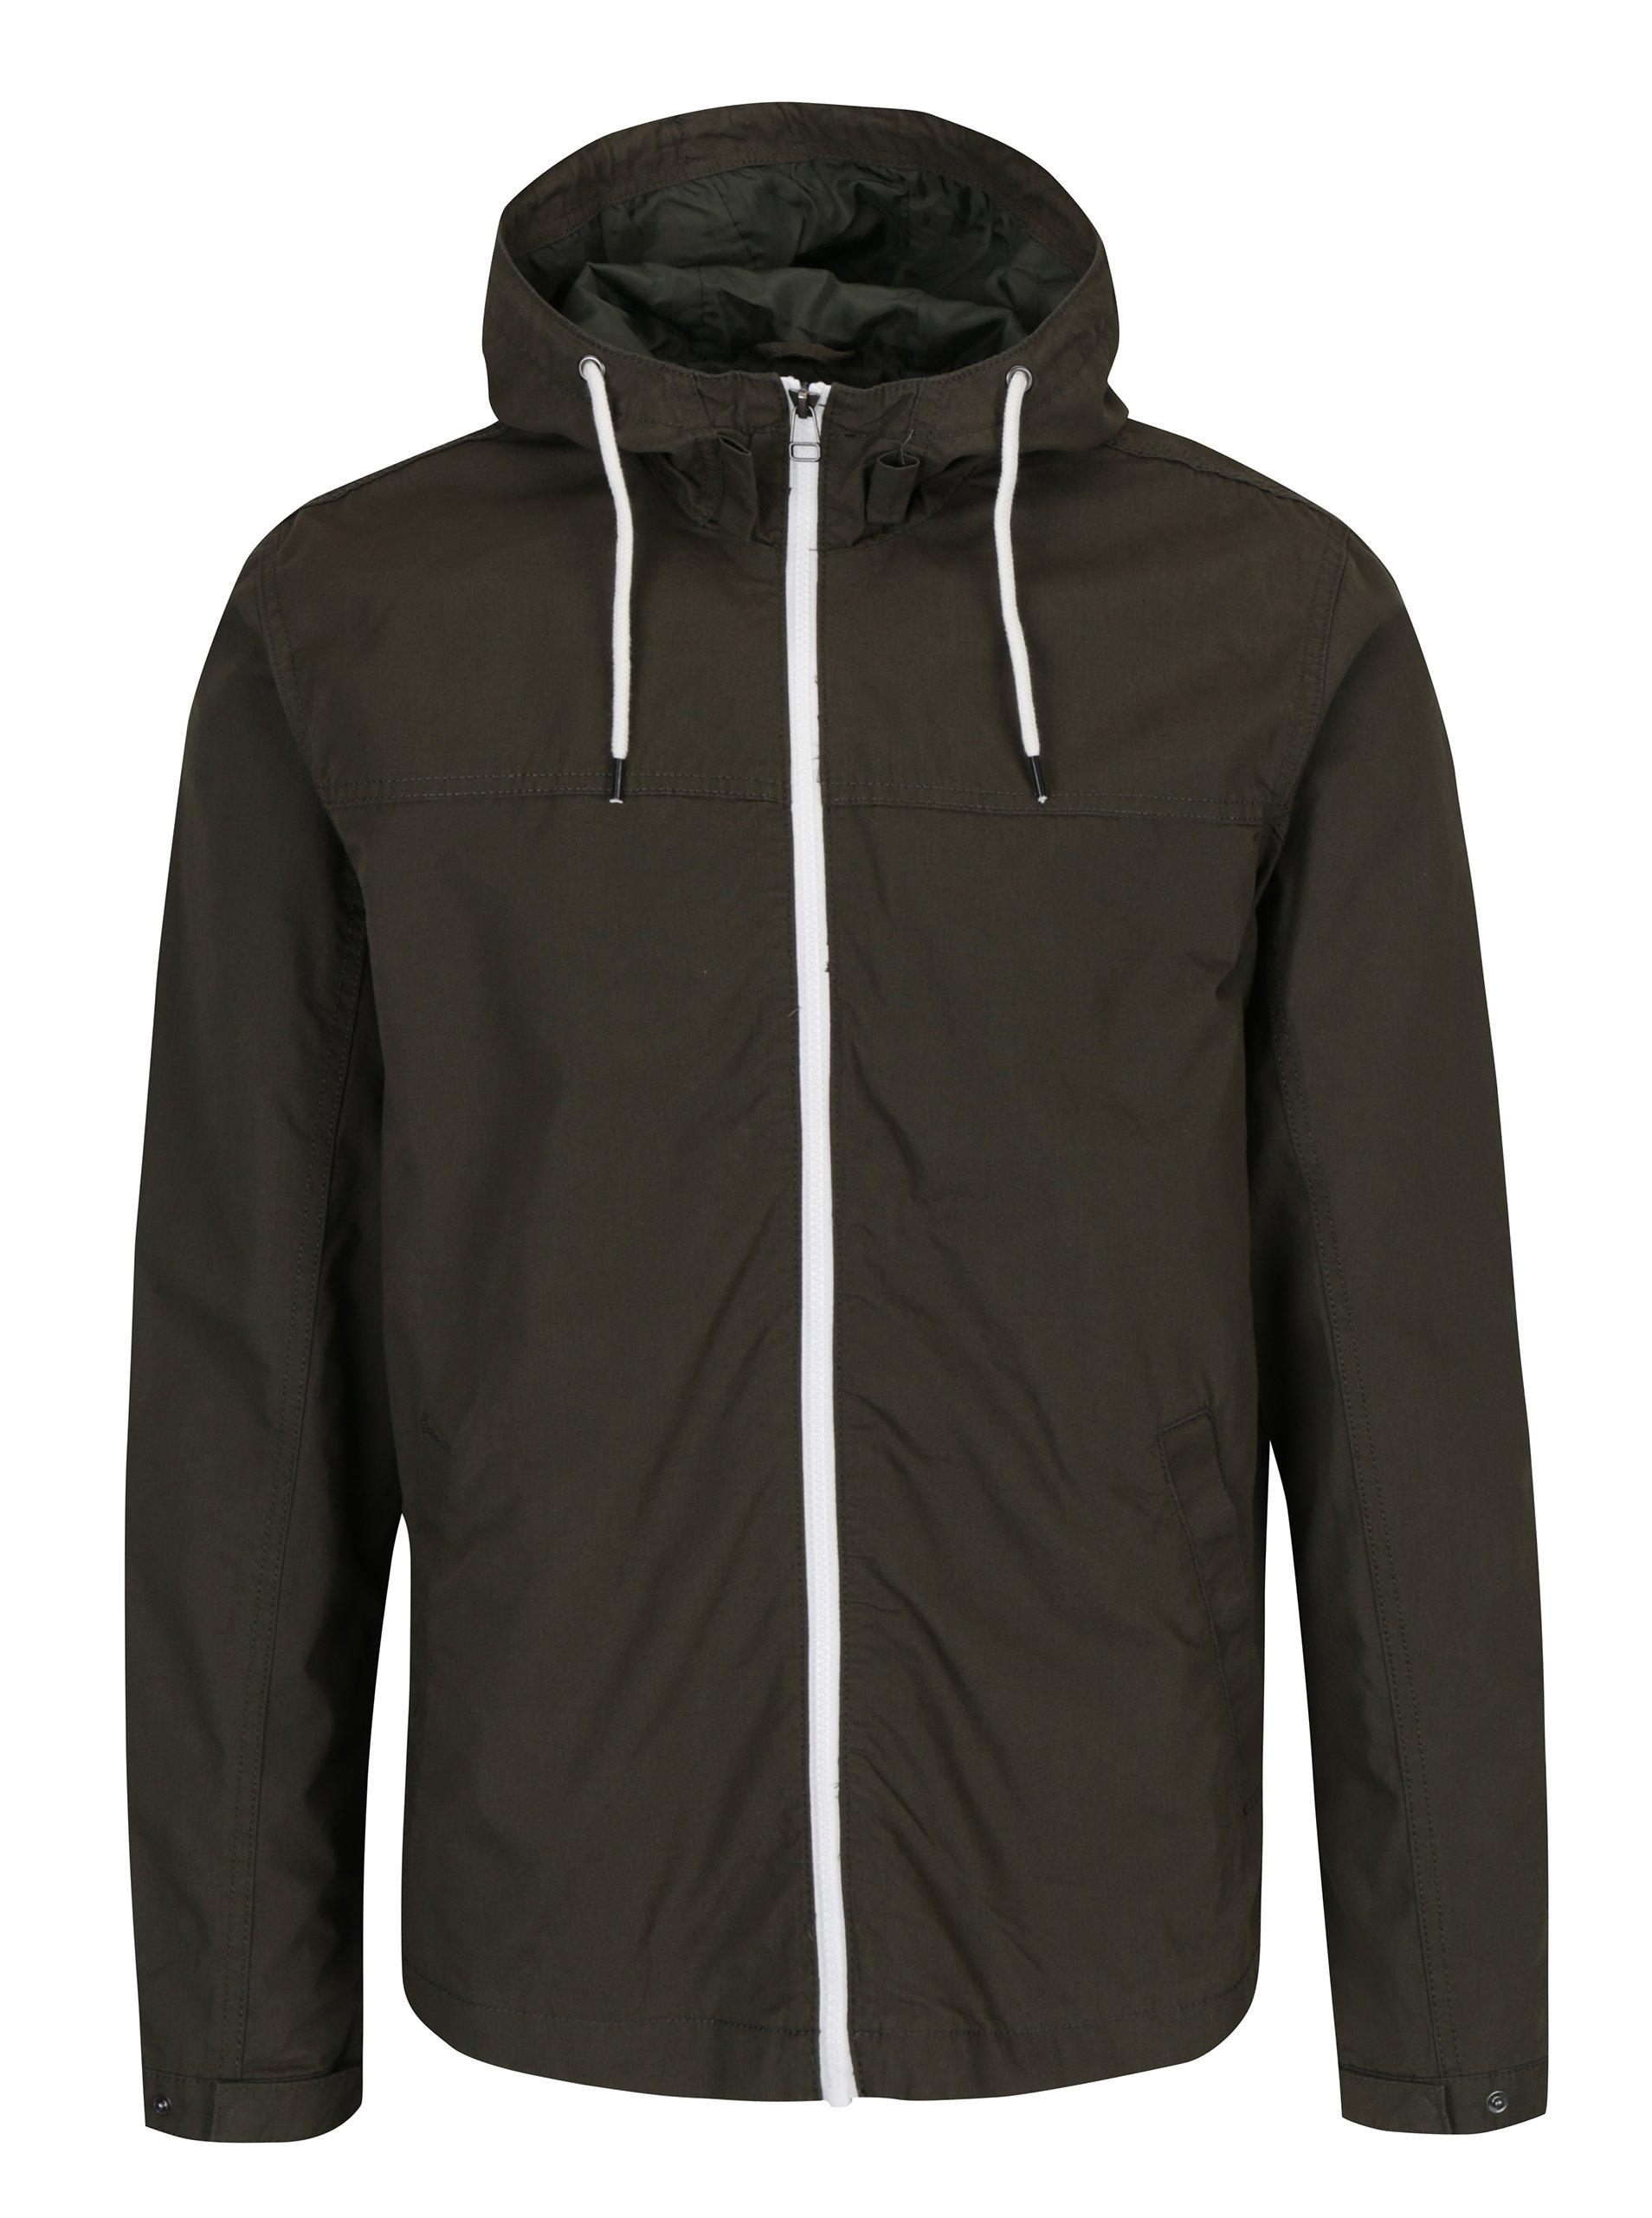 Khaki pánská bunda s kapucí Jack & Jones Floor